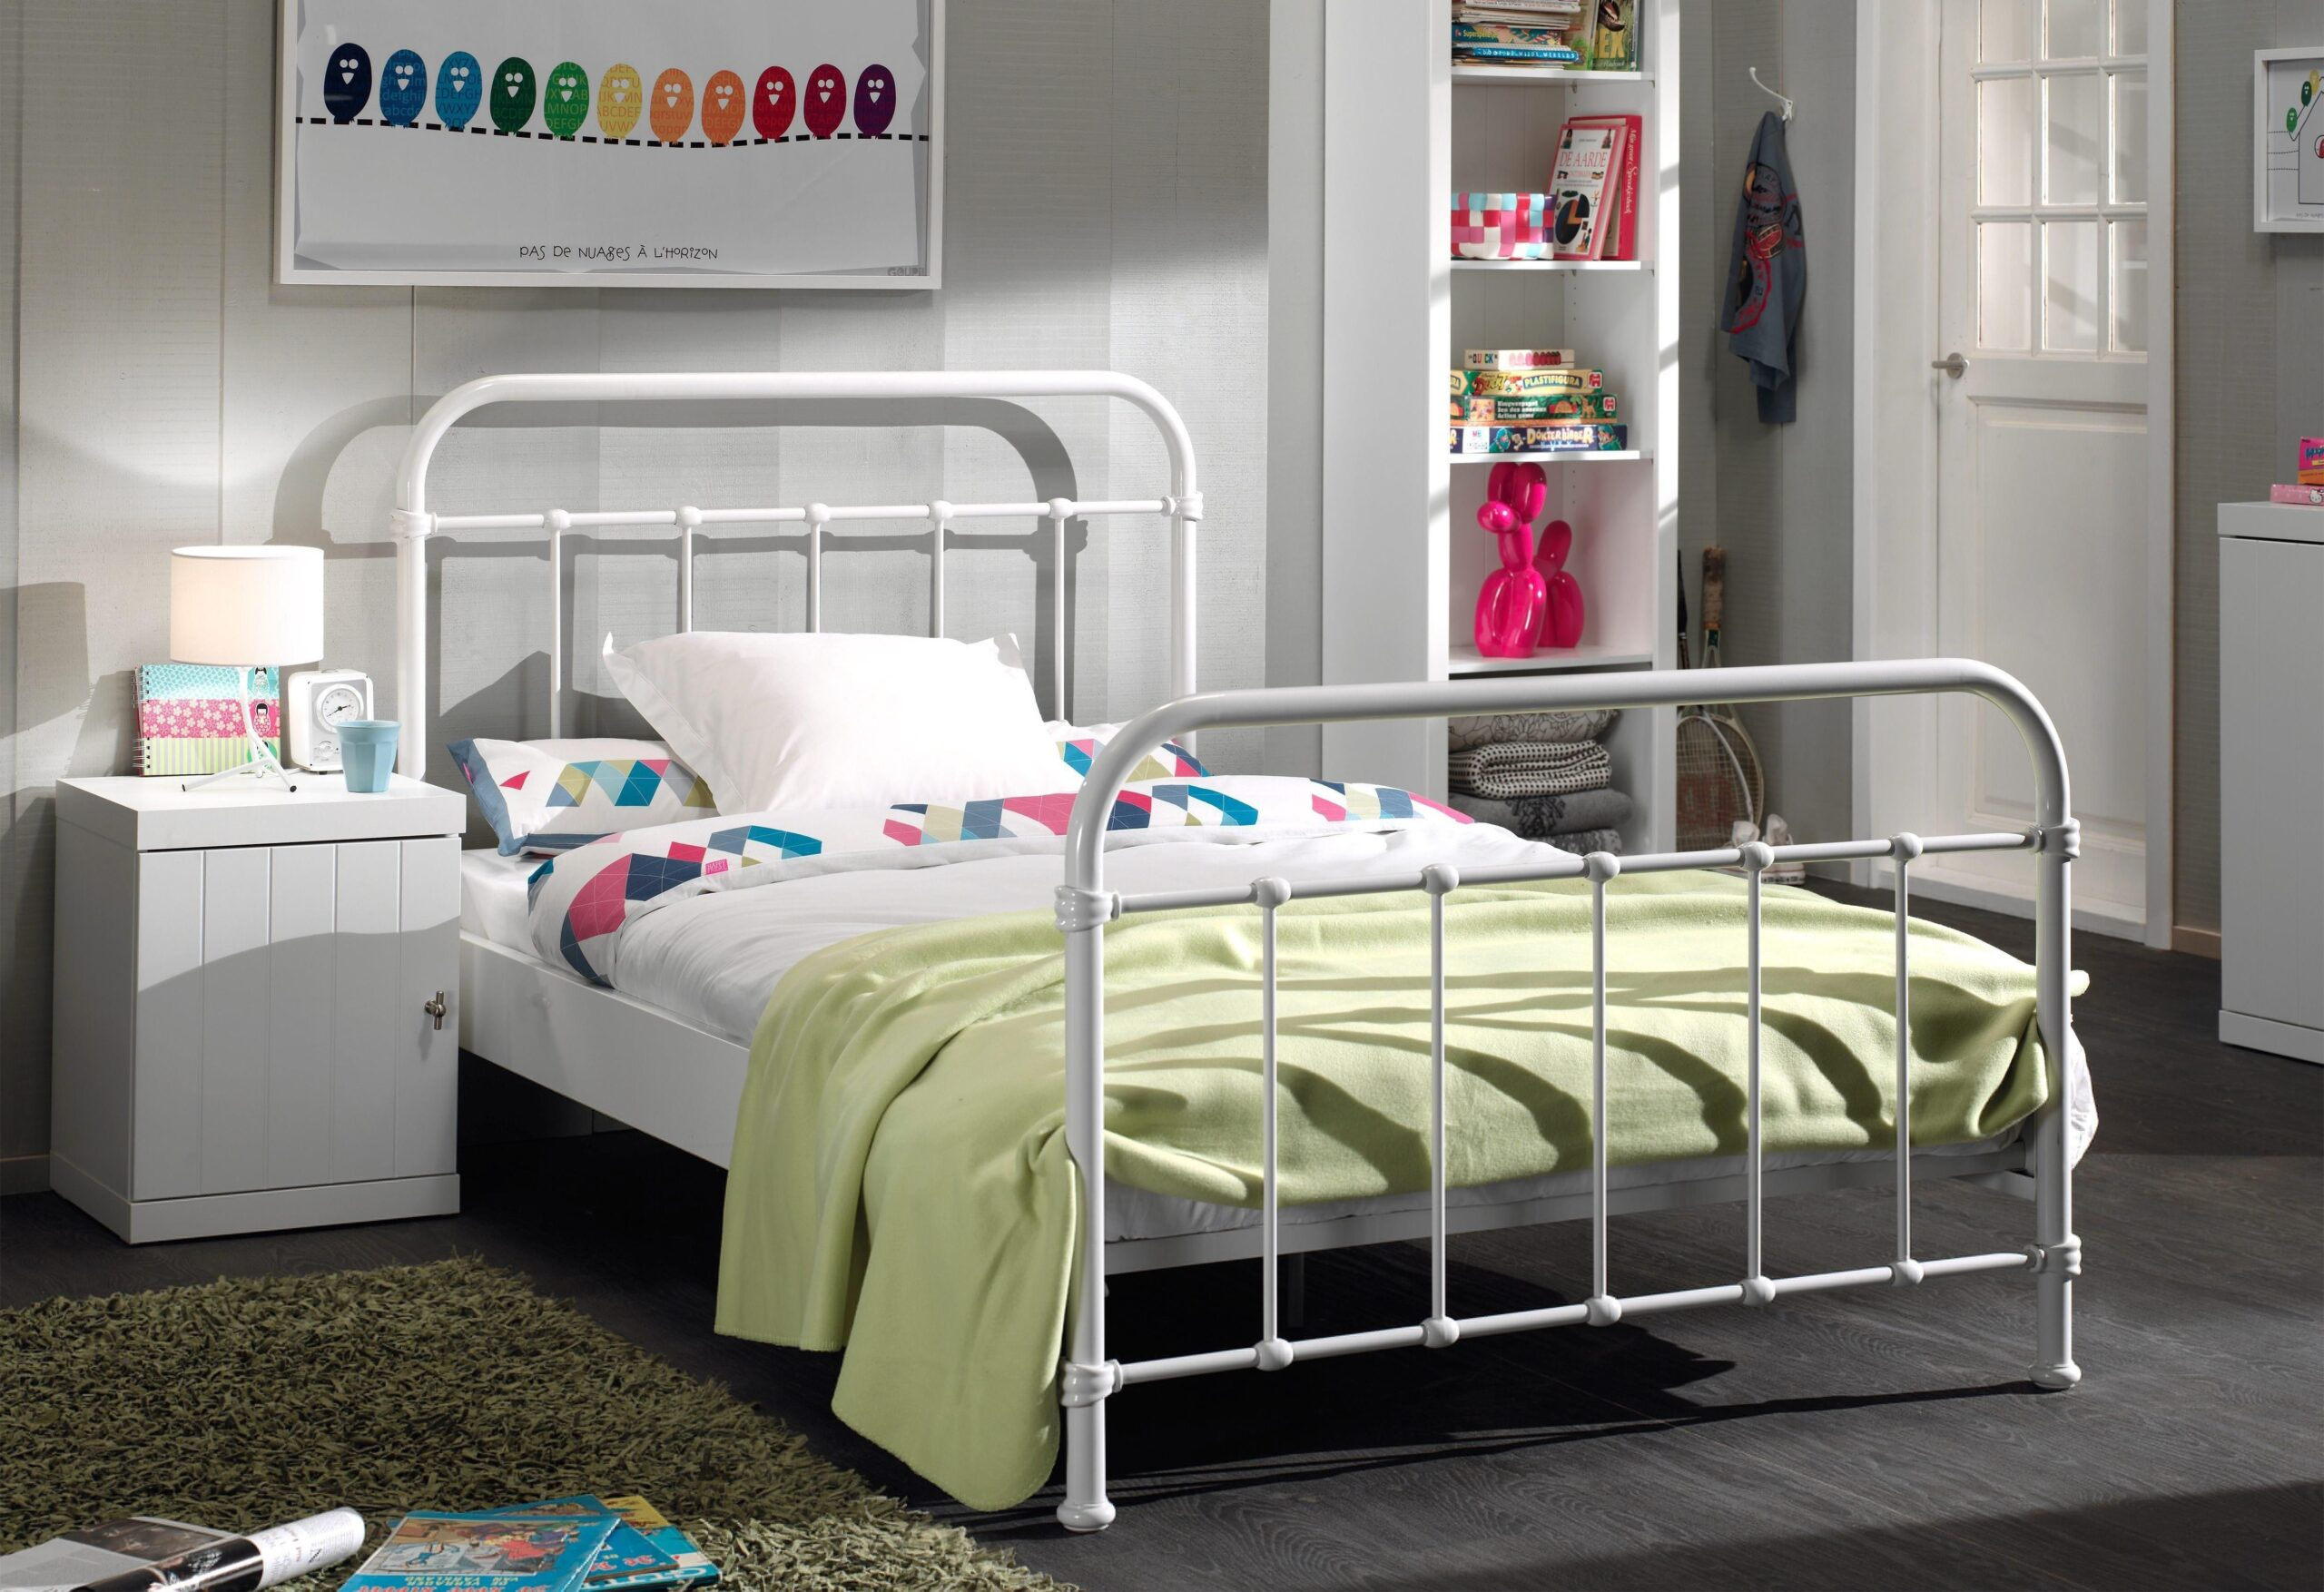 Full Size of Vipack Metallbett Kinderbett Bett Weiß 100x200 Betten Wohnzimmer Metallbett 100x200